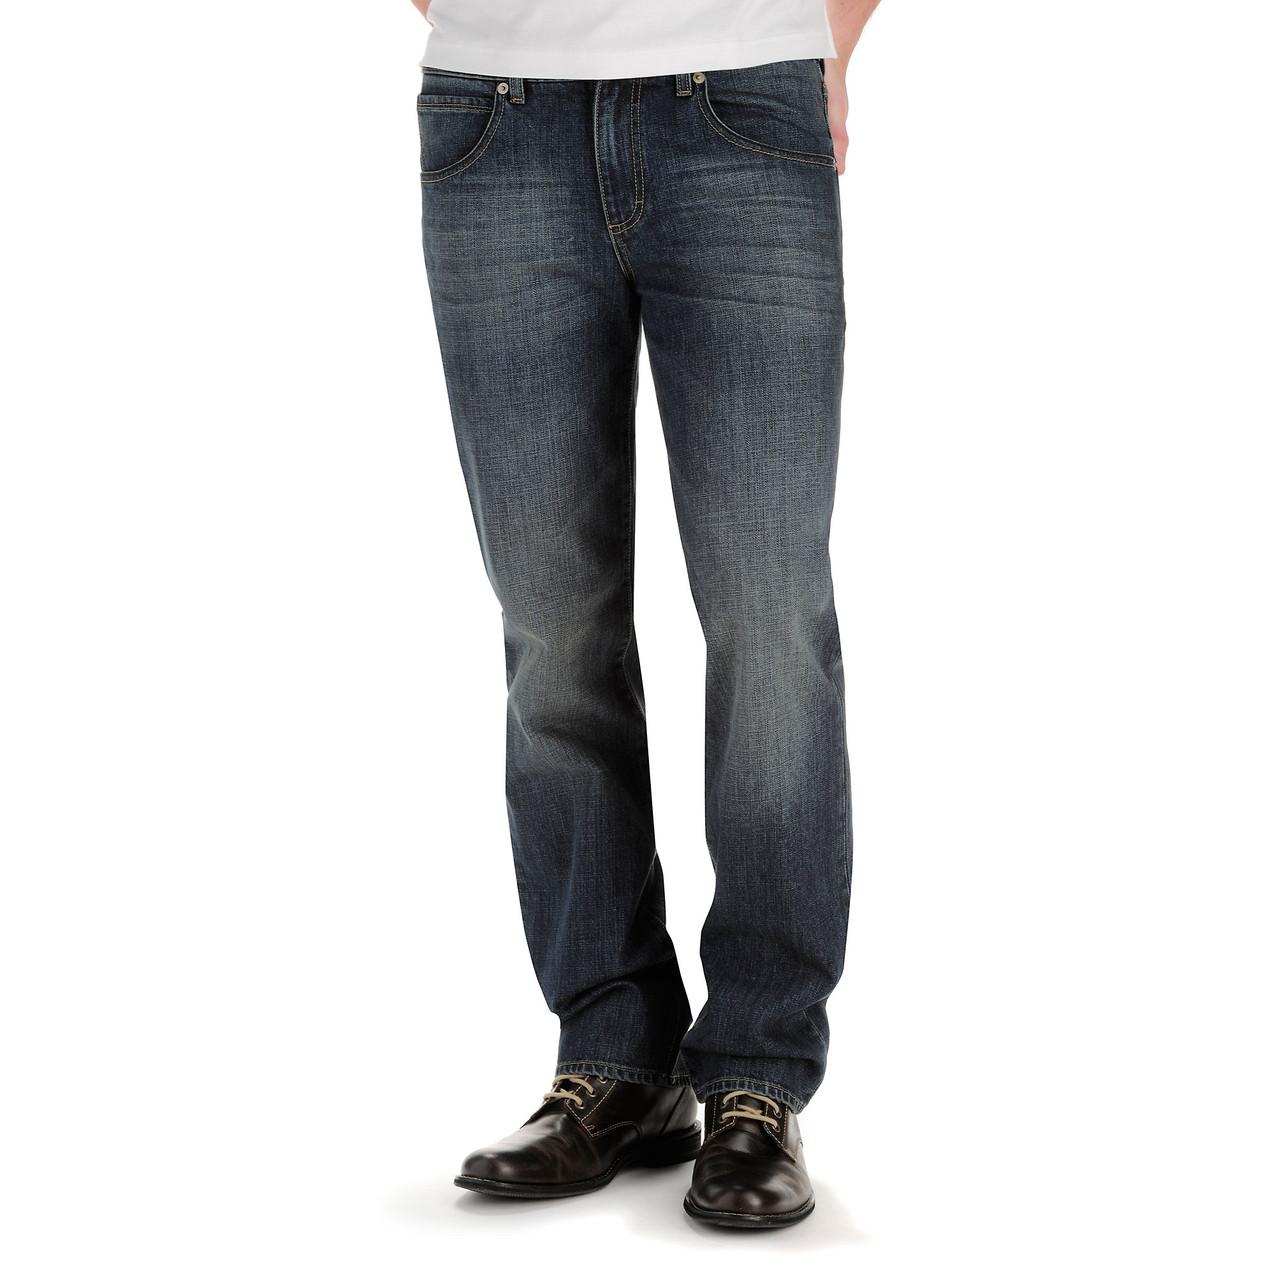 Джинсы Lee Modern Series Straight Fit Straight Leg, Blue Devil, 32W32L, 2013621